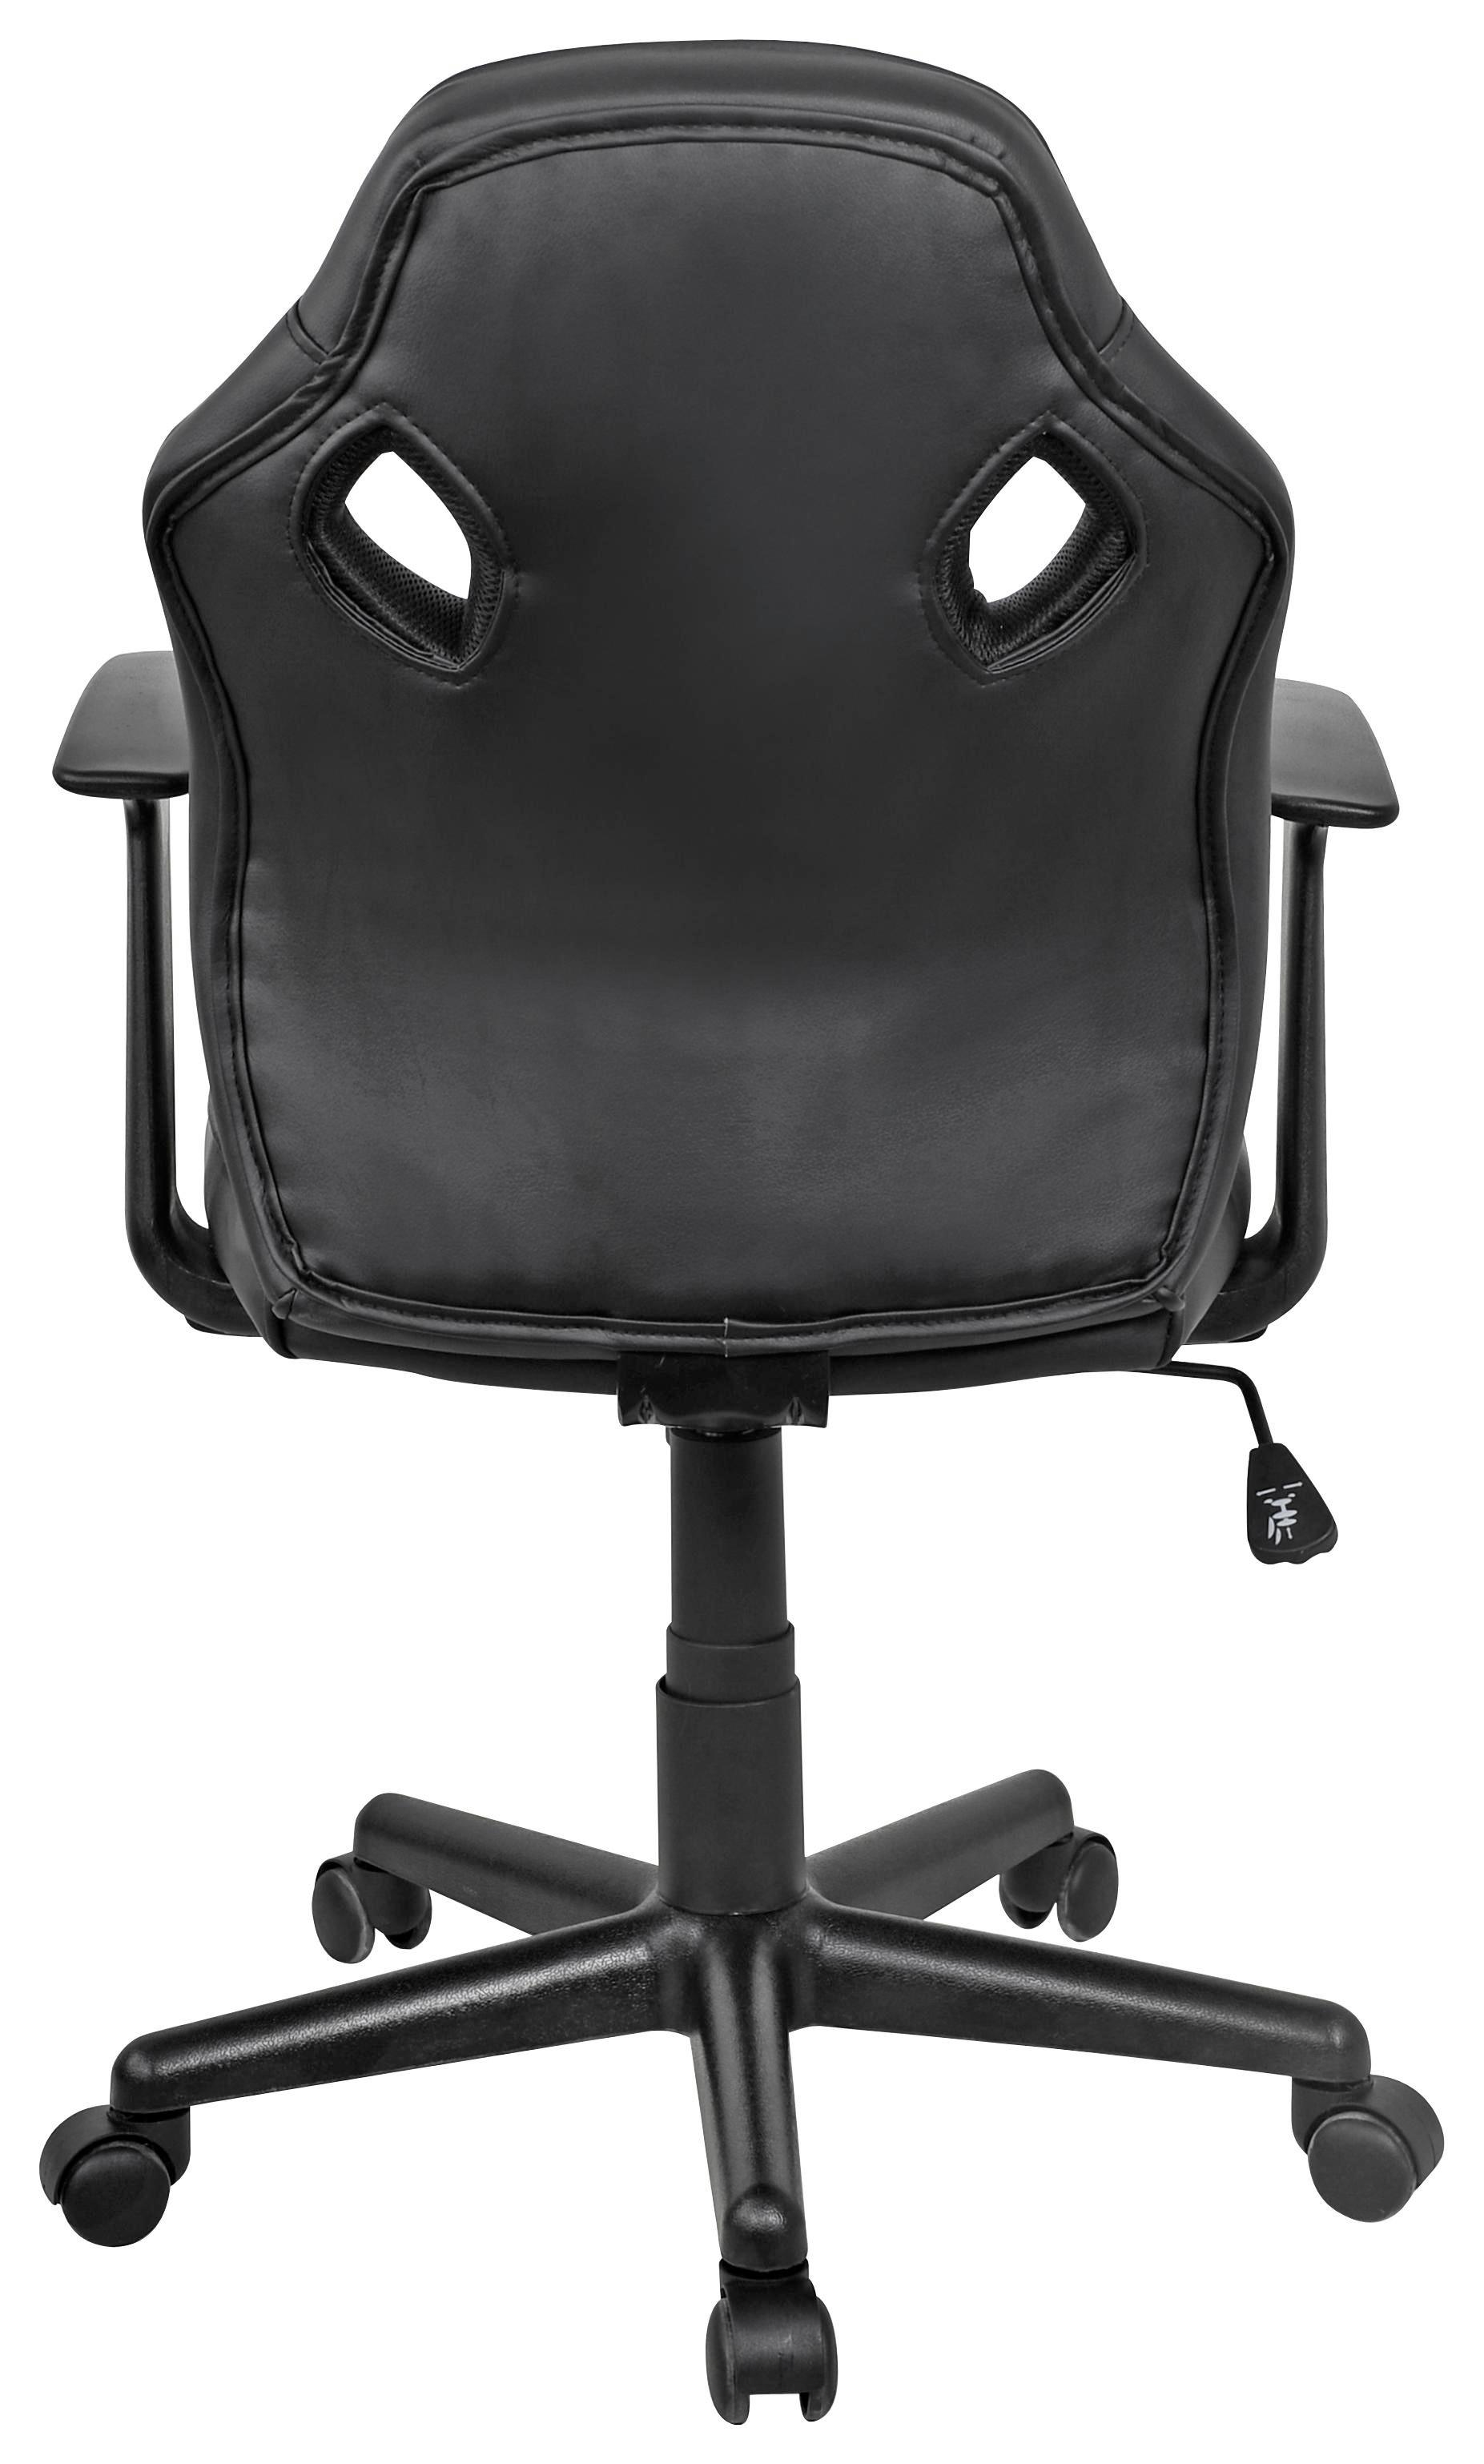 Forgószék Billy - fekete/szürke, modern, műanyag/textil (59,5/89-99/60,5cm)